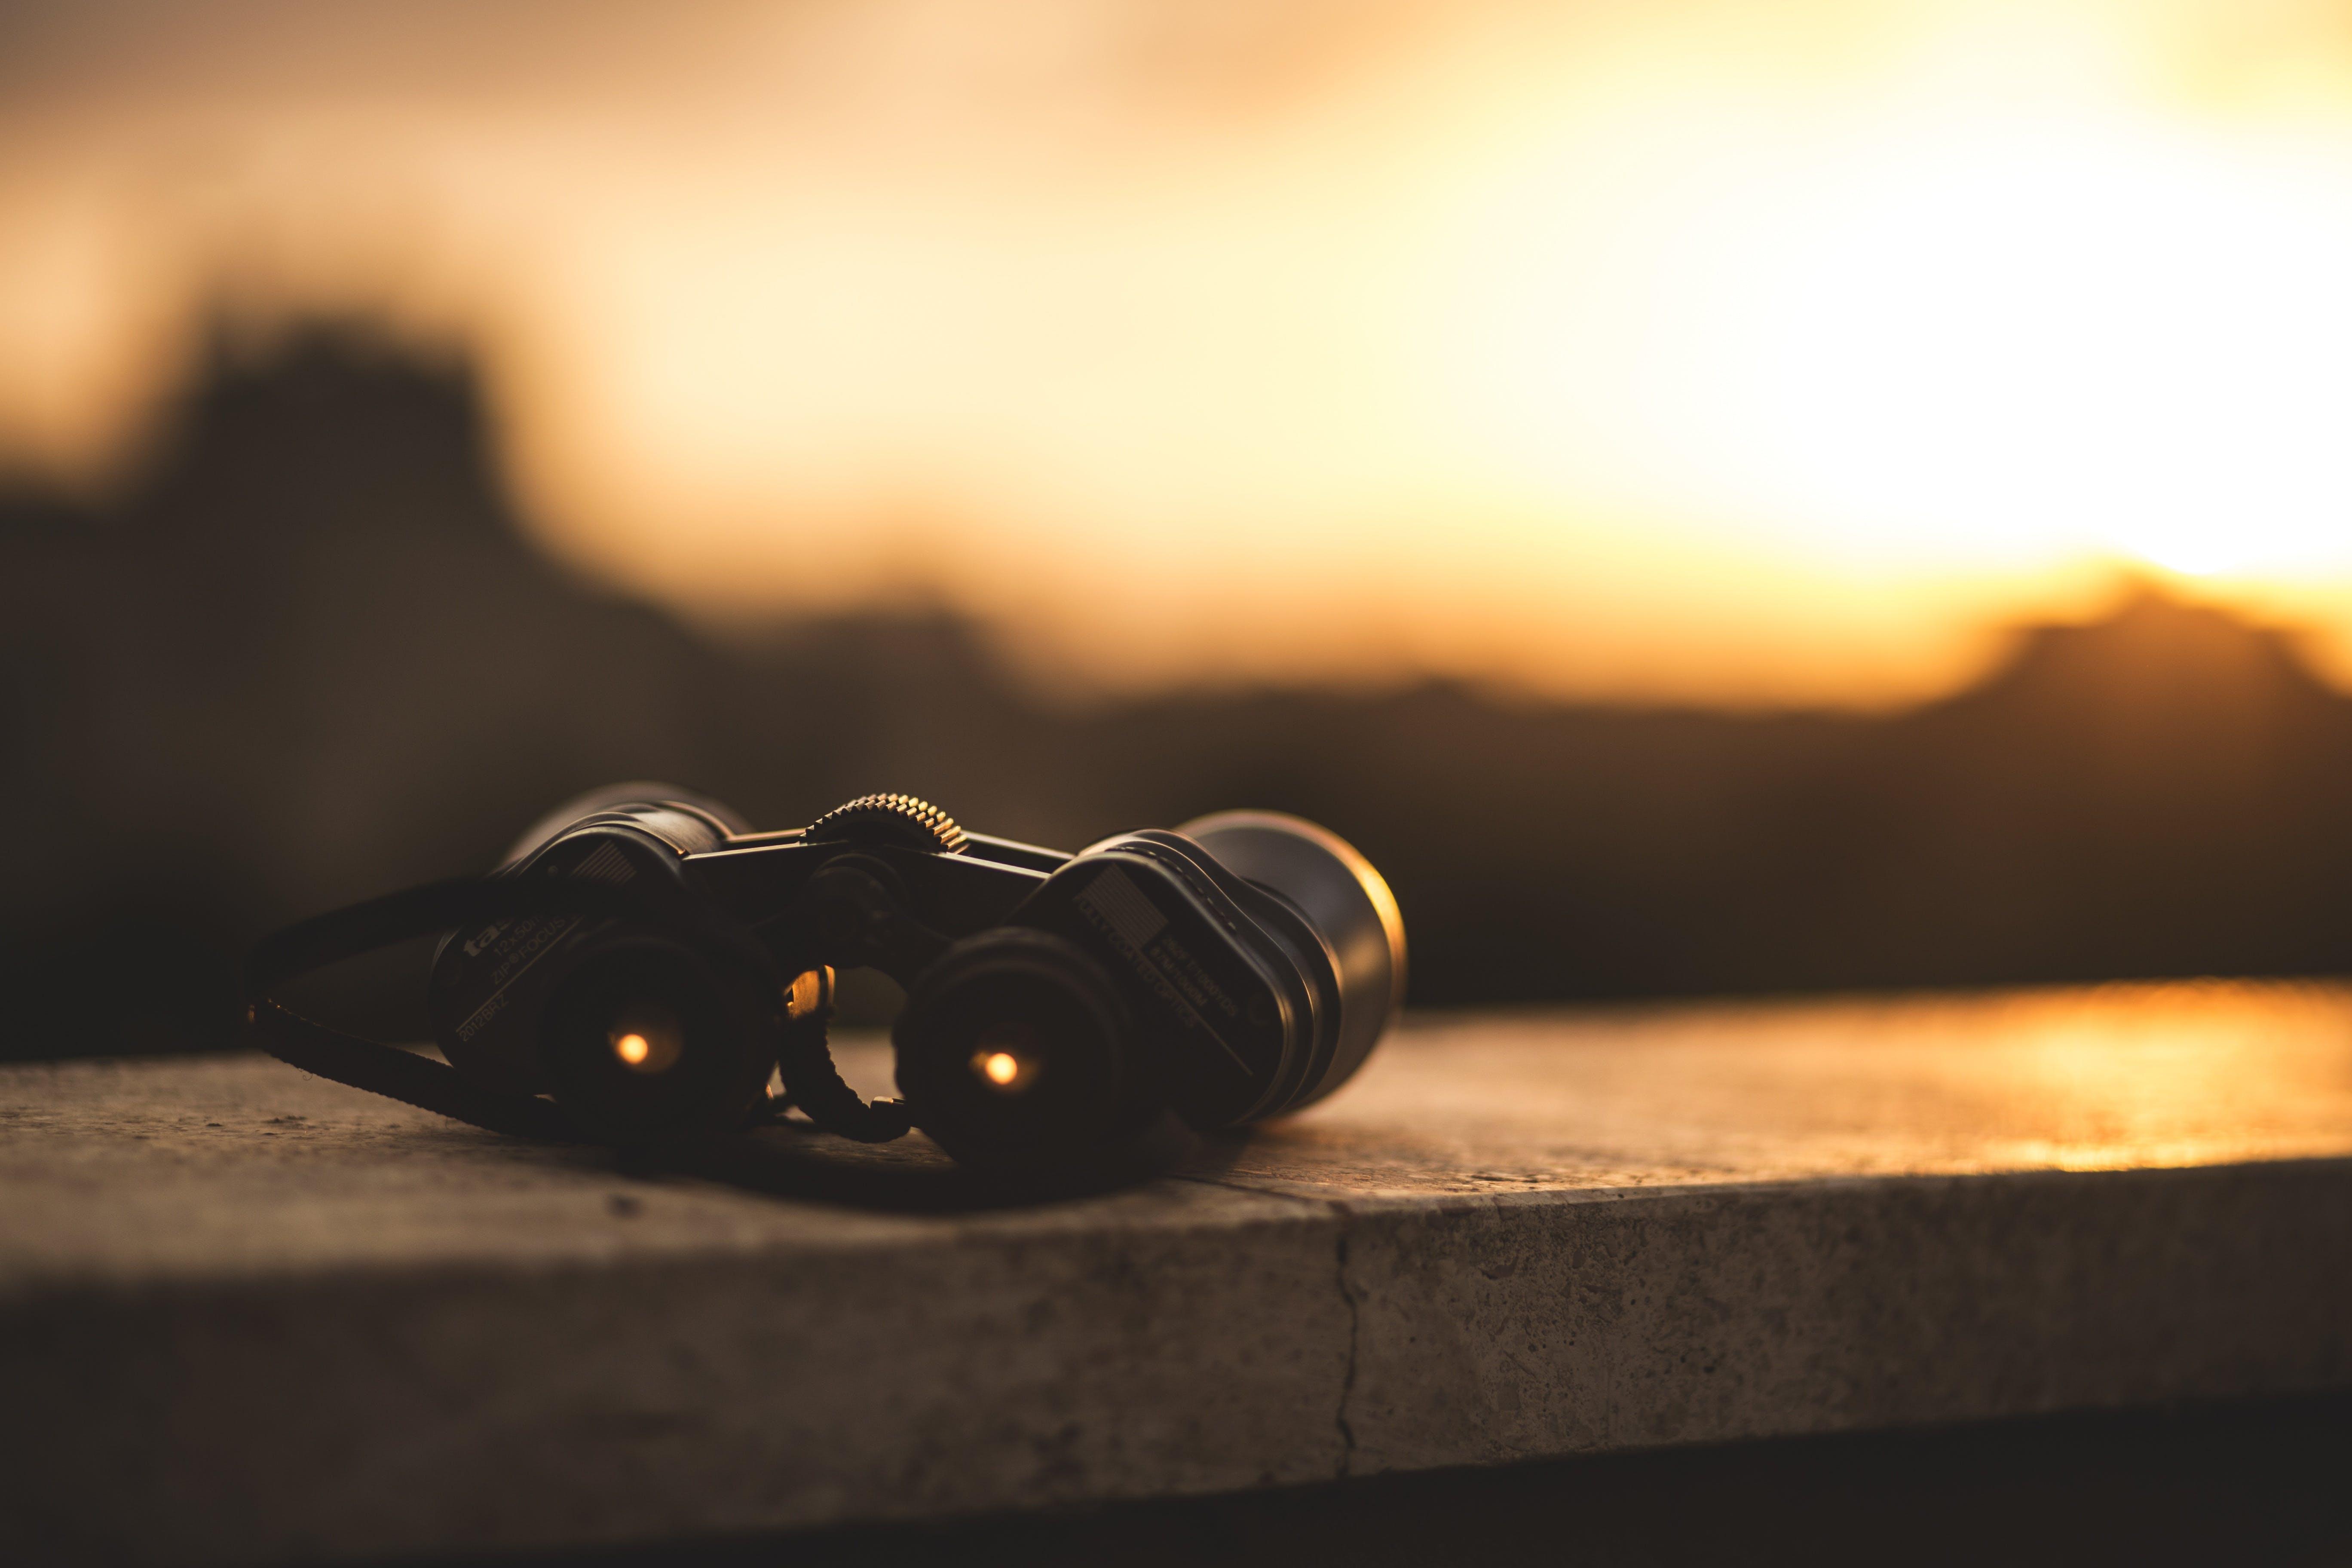 Black Binocular on Grey Concrete Frame